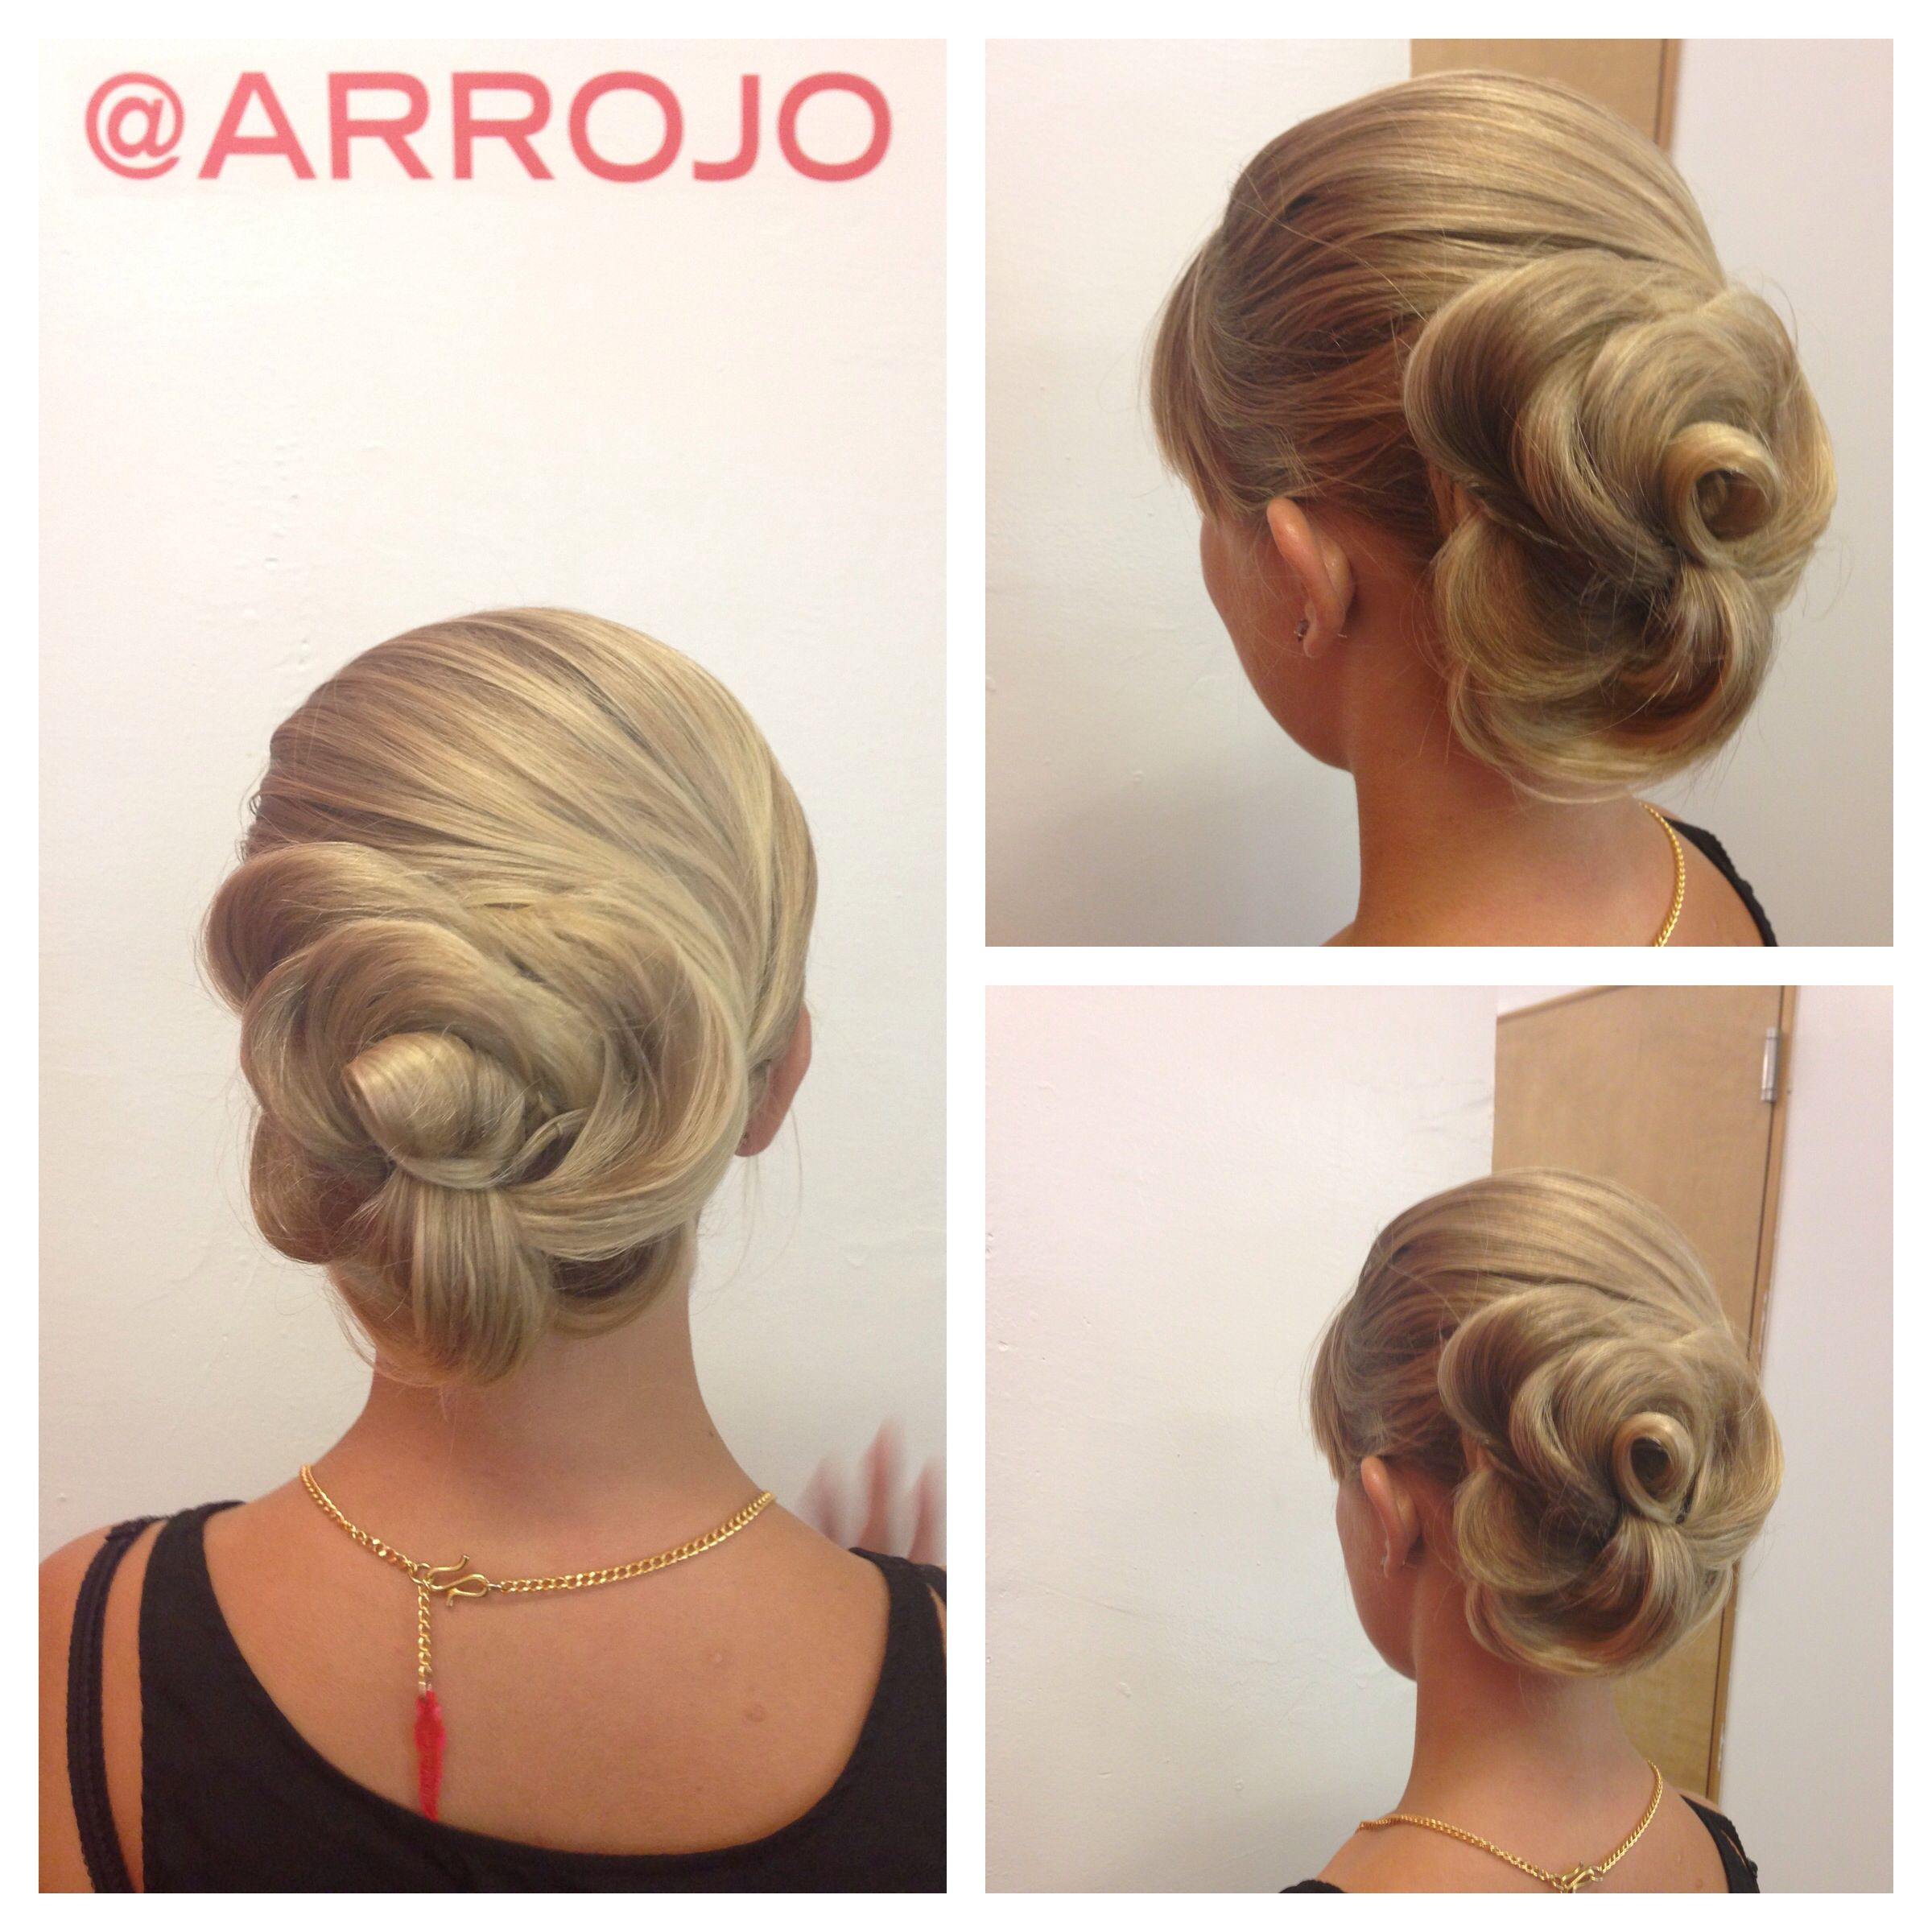 Rose updo rose braid sleek hairstyles braids